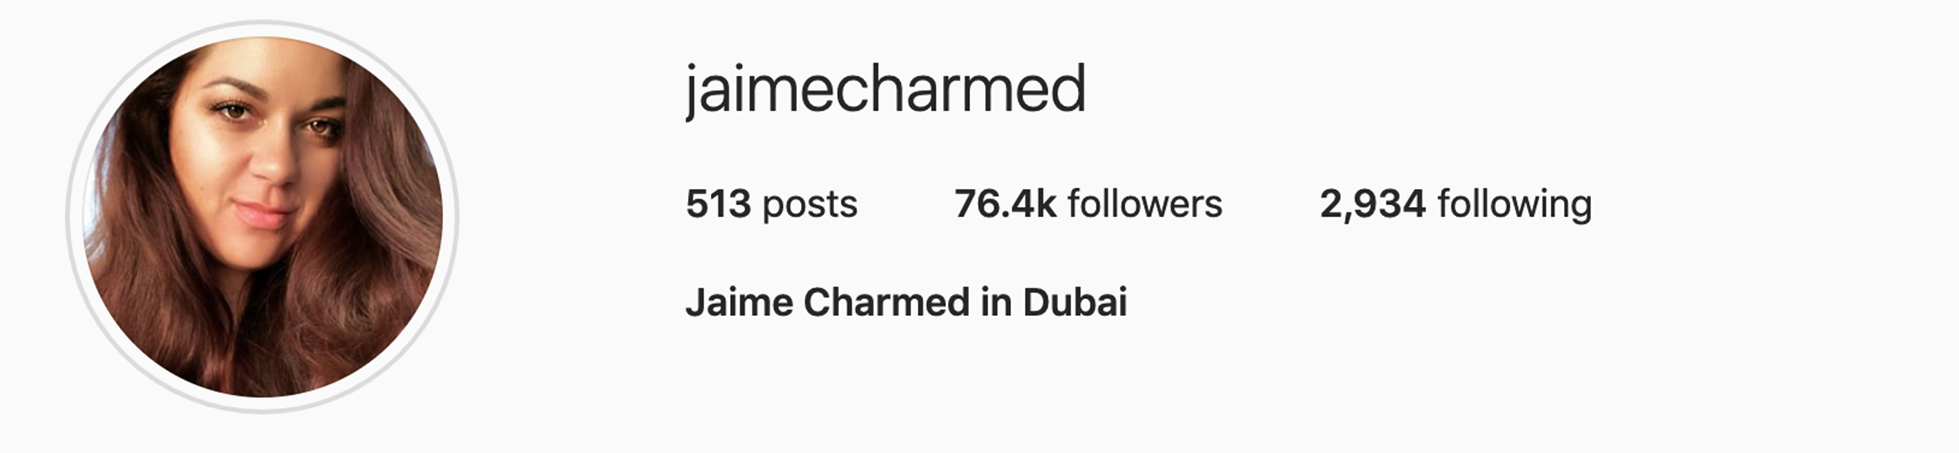 JaimeCharmed_Influencer-followers.jpg